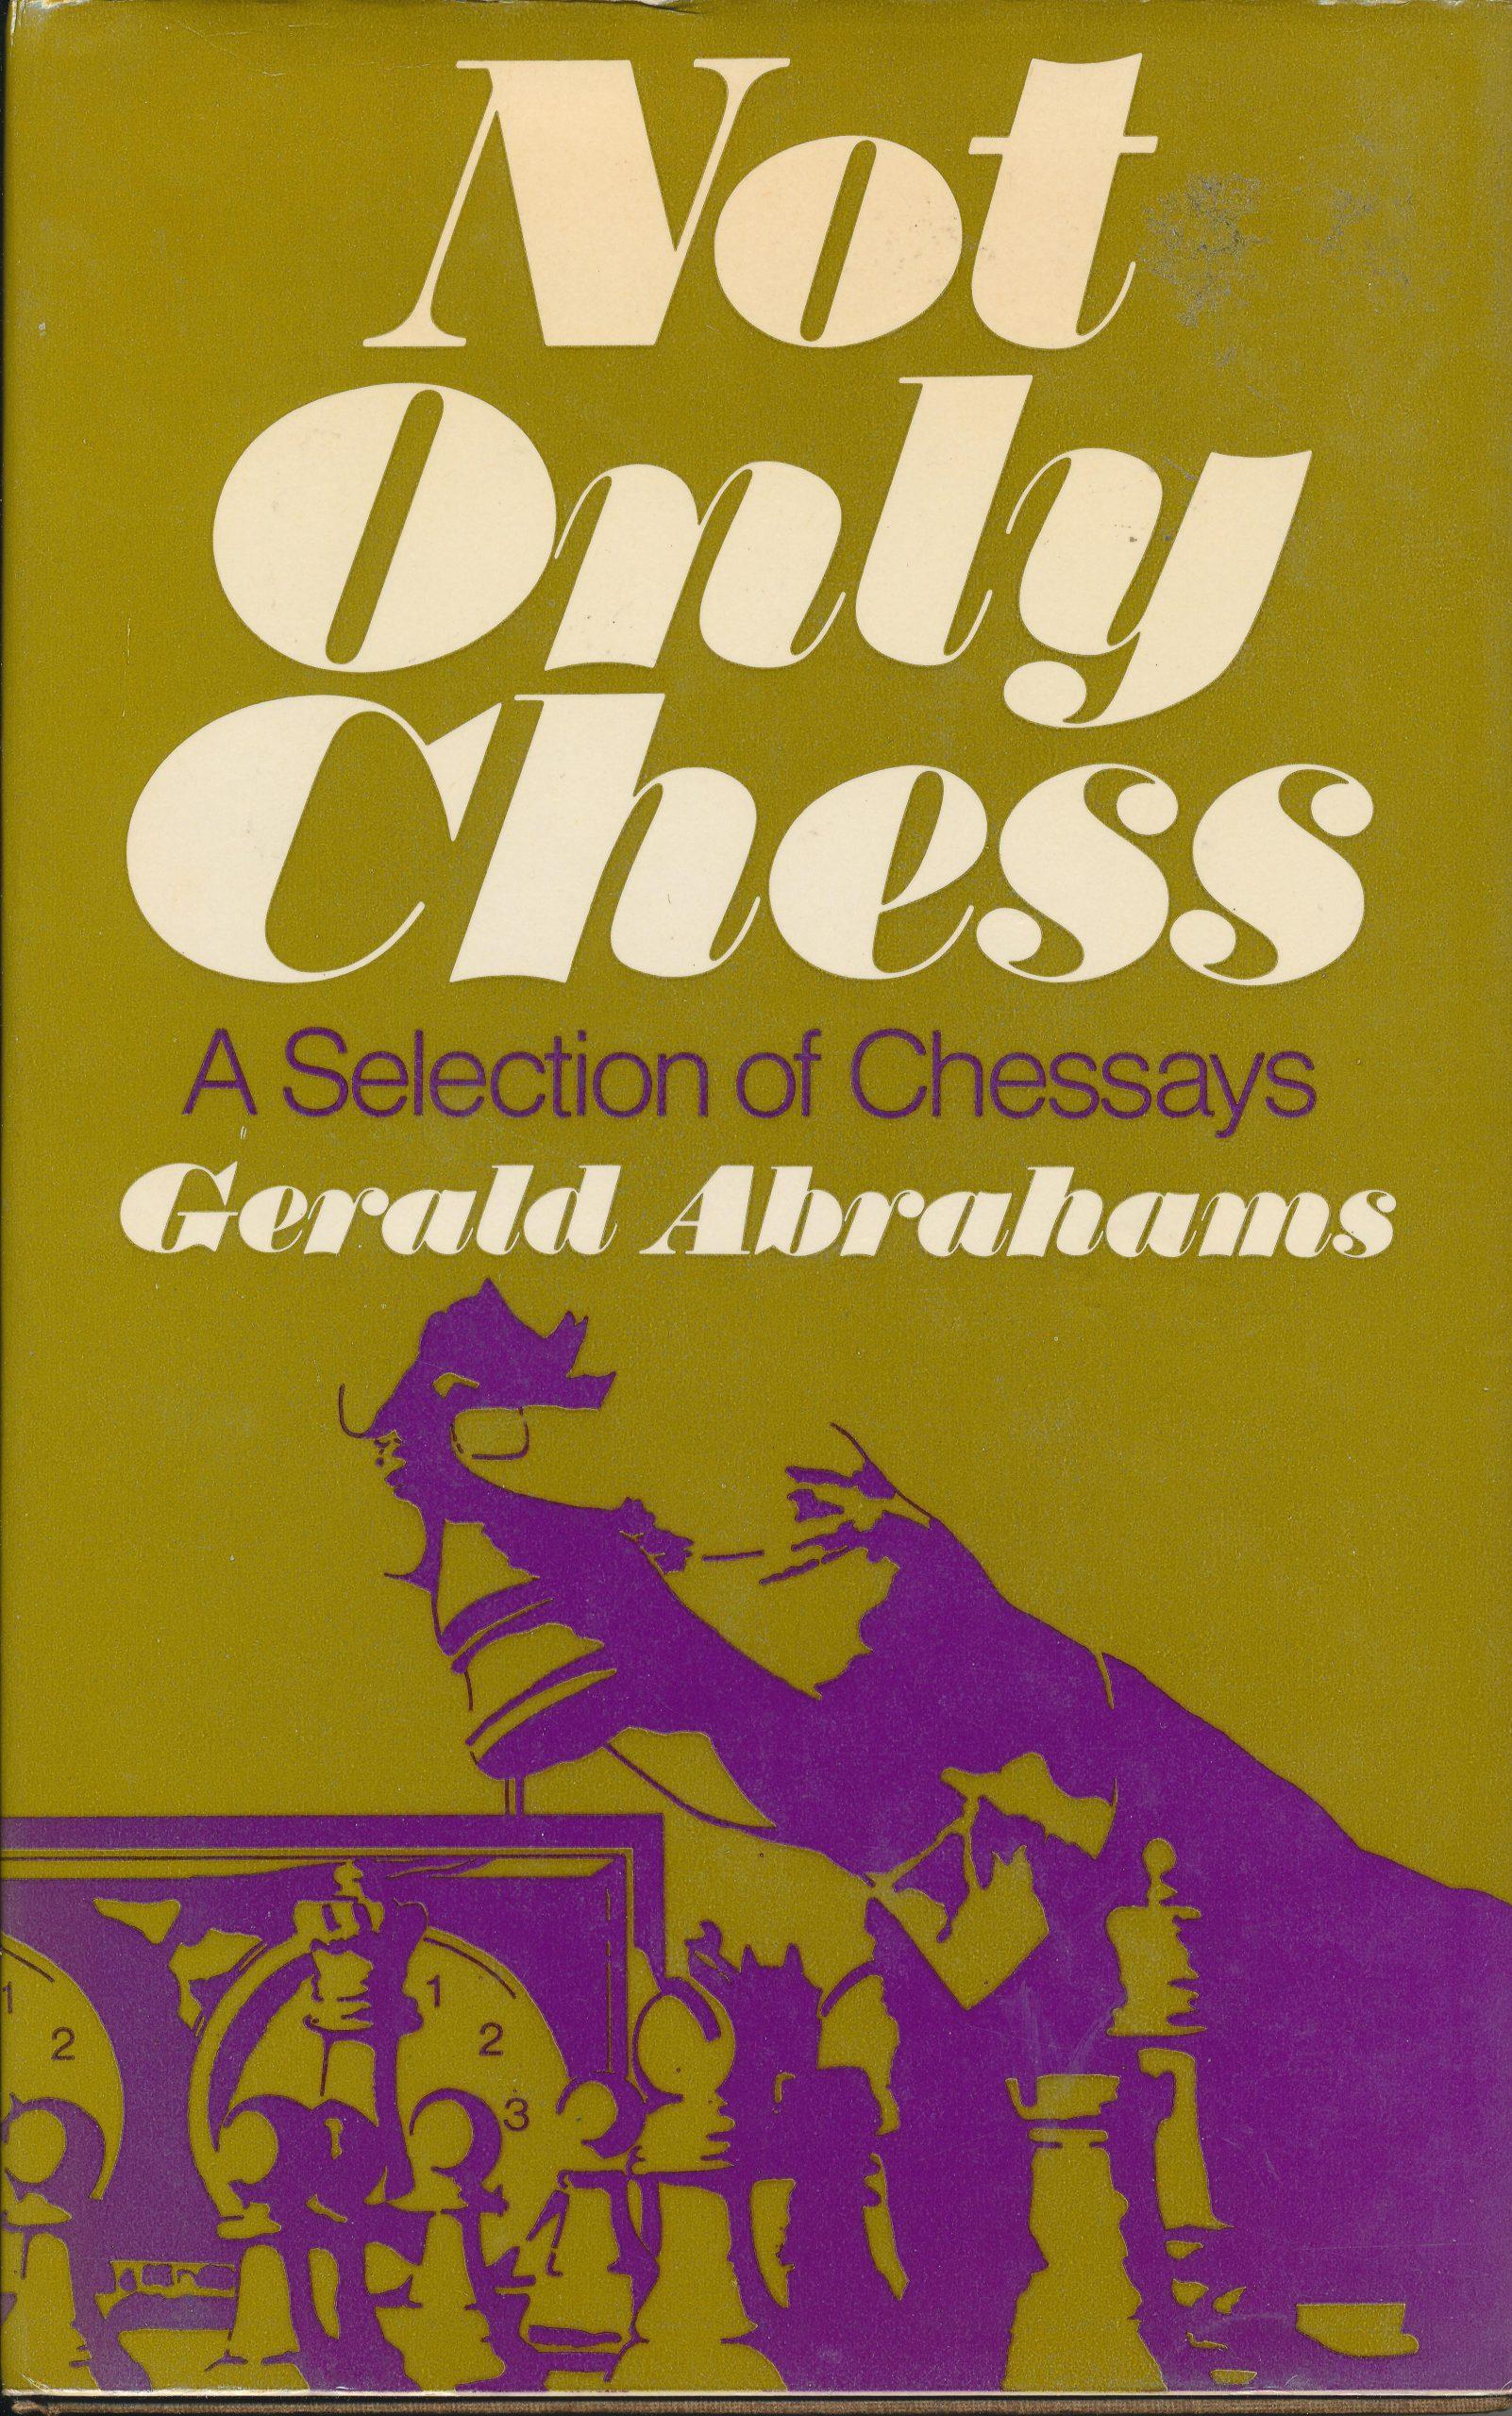 Not Only Chess, Gerald Abrahams, George Allen & Unwin Ltd., 1974, ISBN 0 04 794005 0